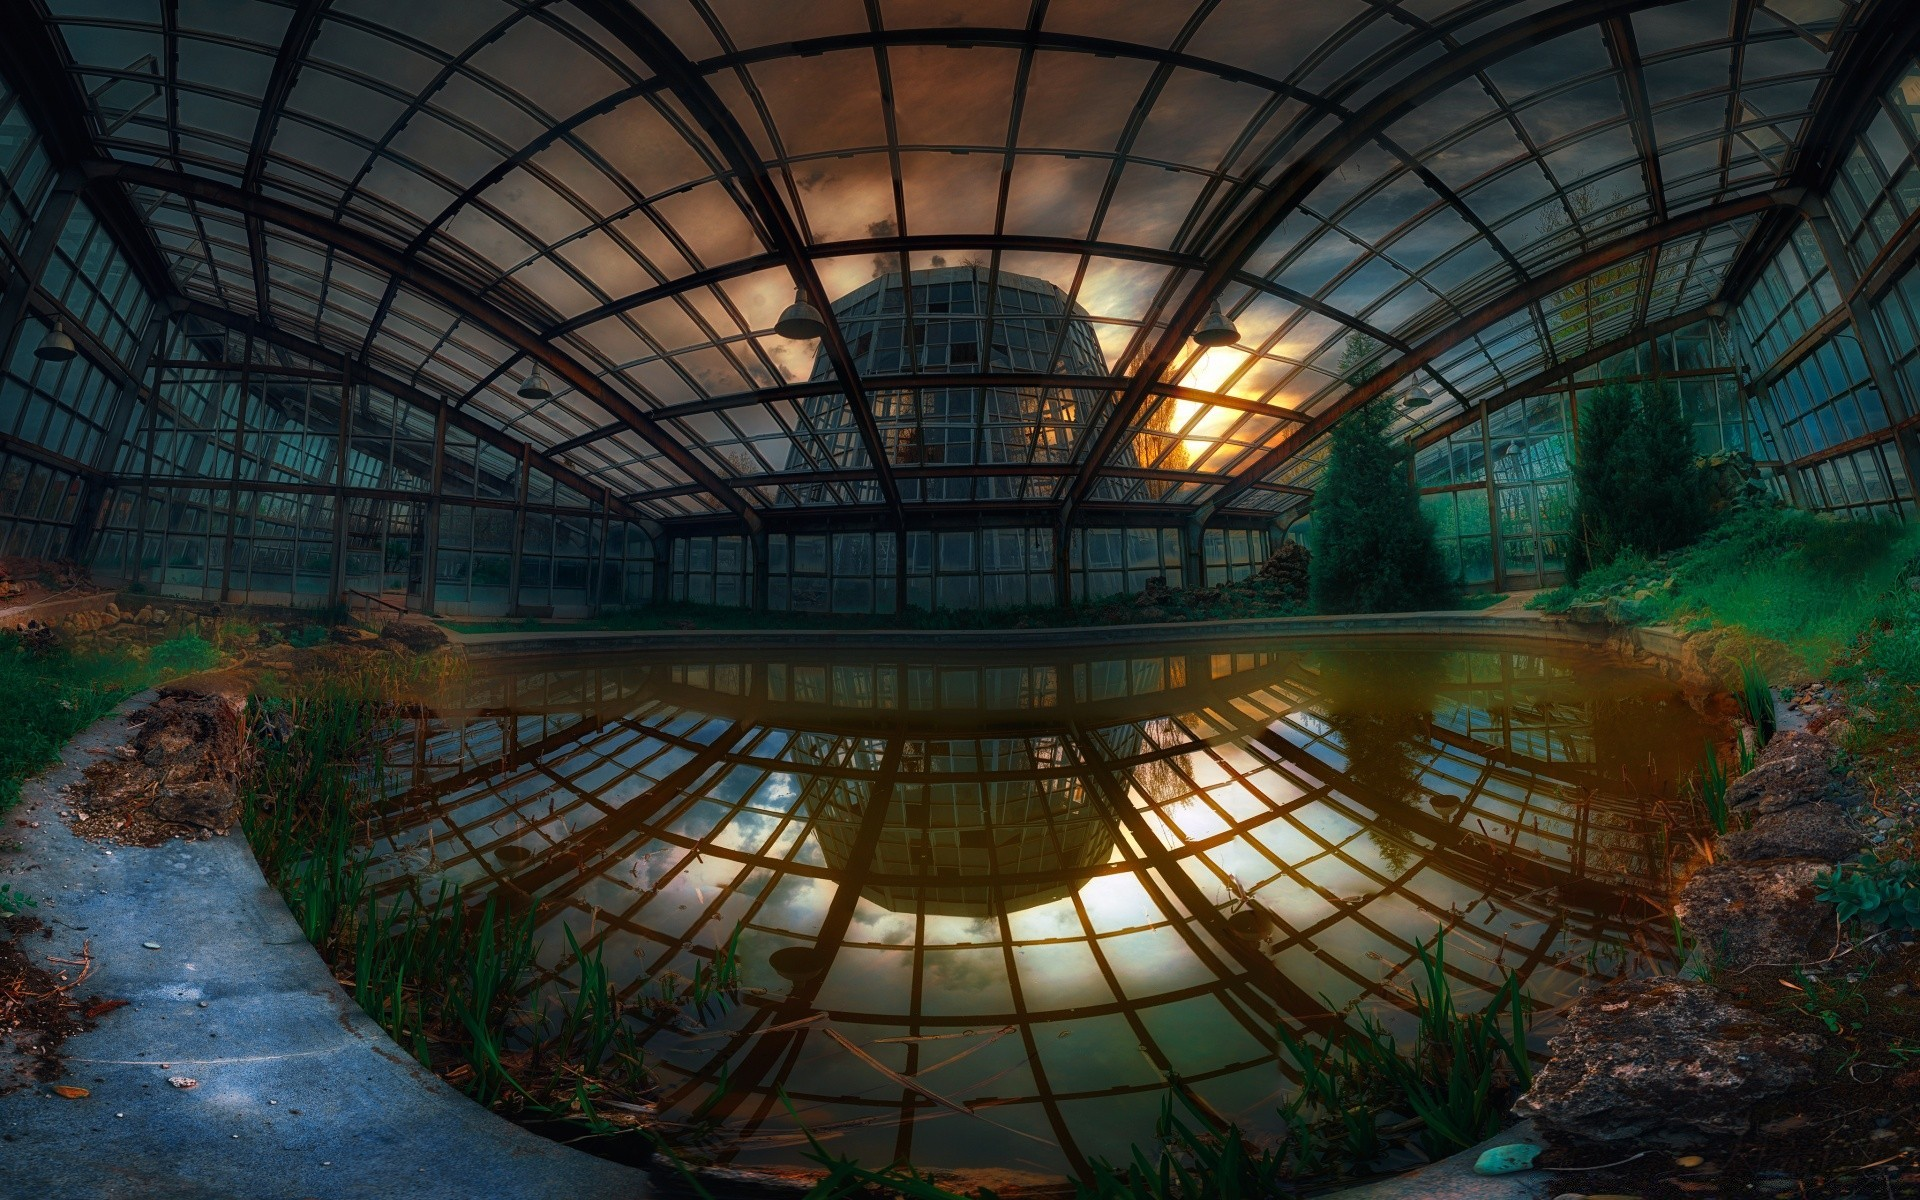 Ботанический сад в ереване фото